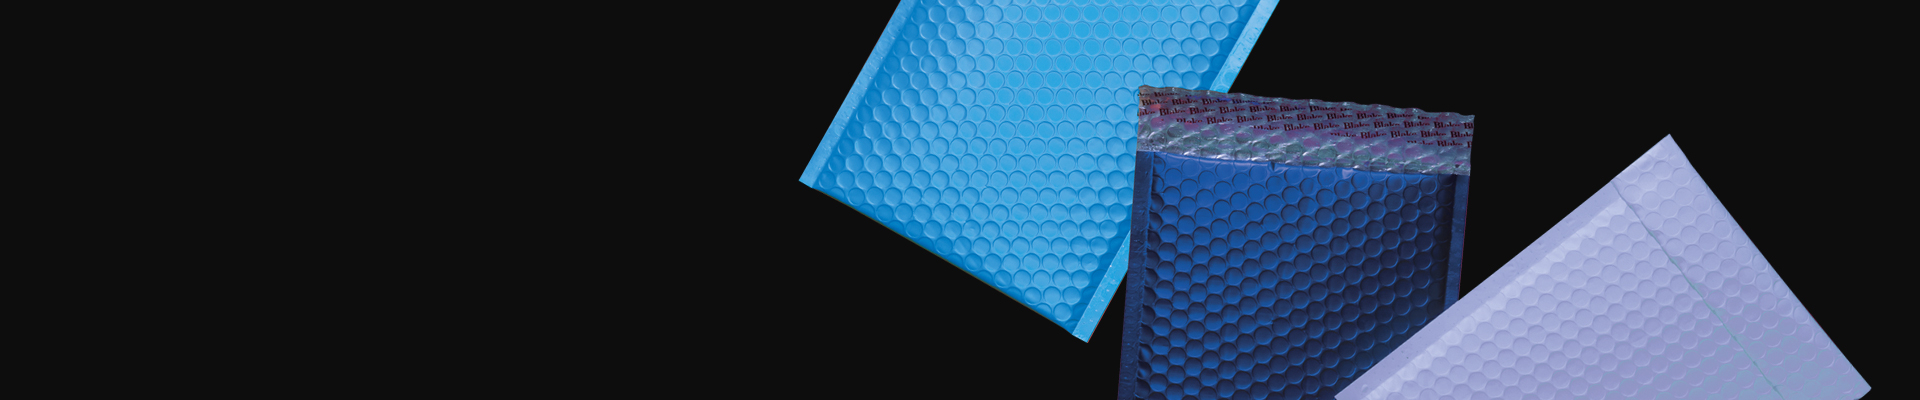 Creative Colour Matt Padded Bubble Envelopes